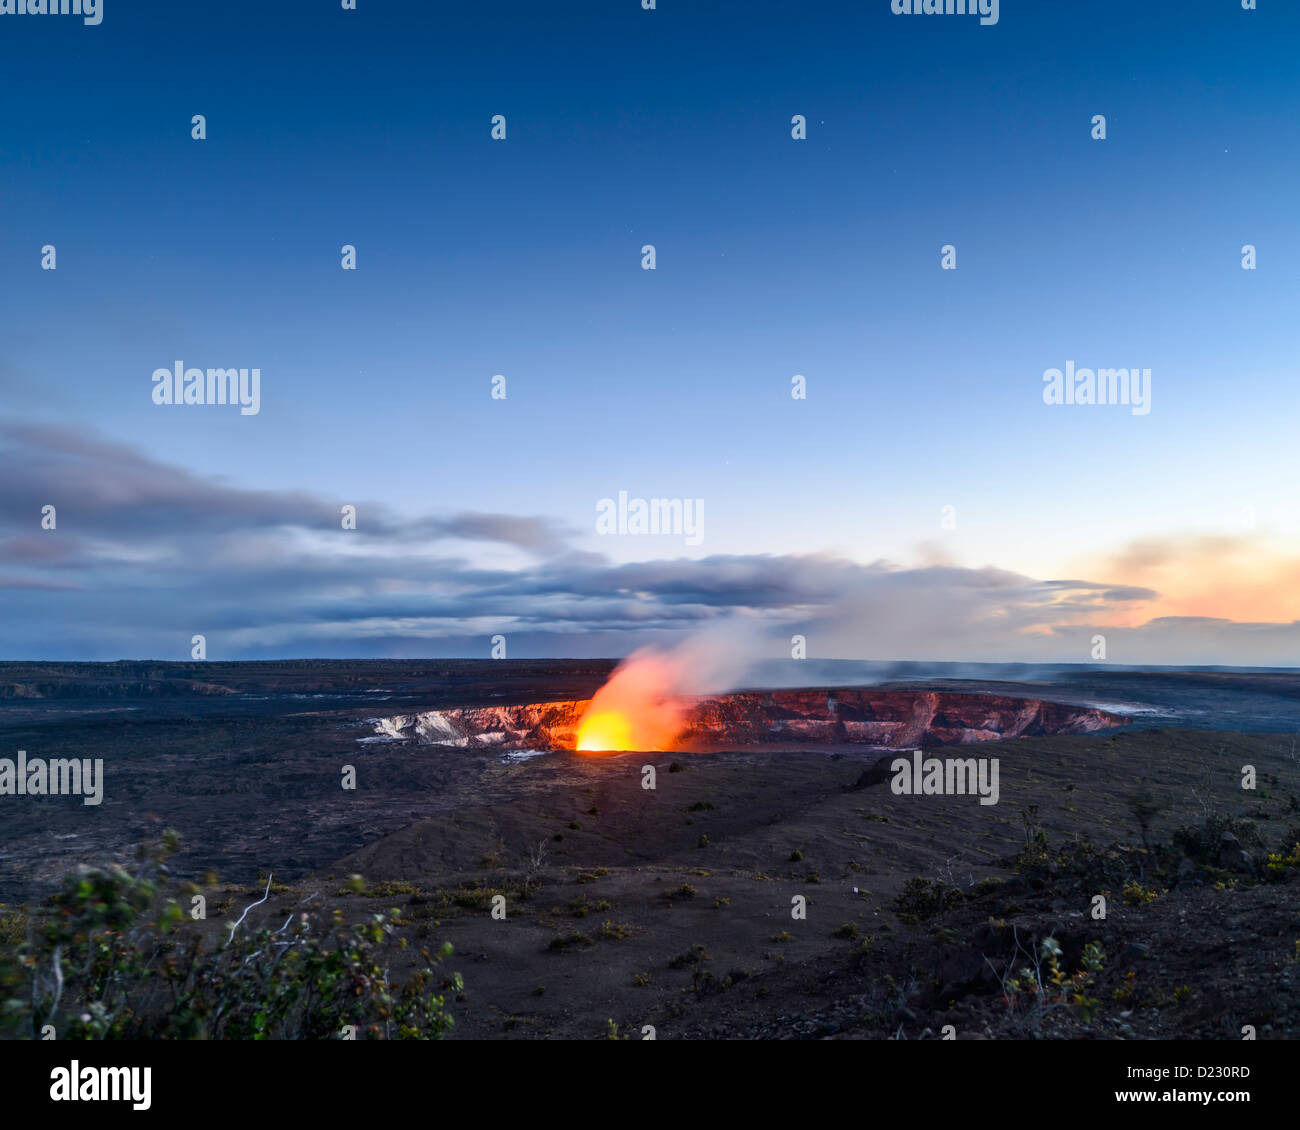 Halemaumau Caldera, Kilauea Volcano,Volcanoes National Park, Big Island, Hawaii, USA - Stock Image